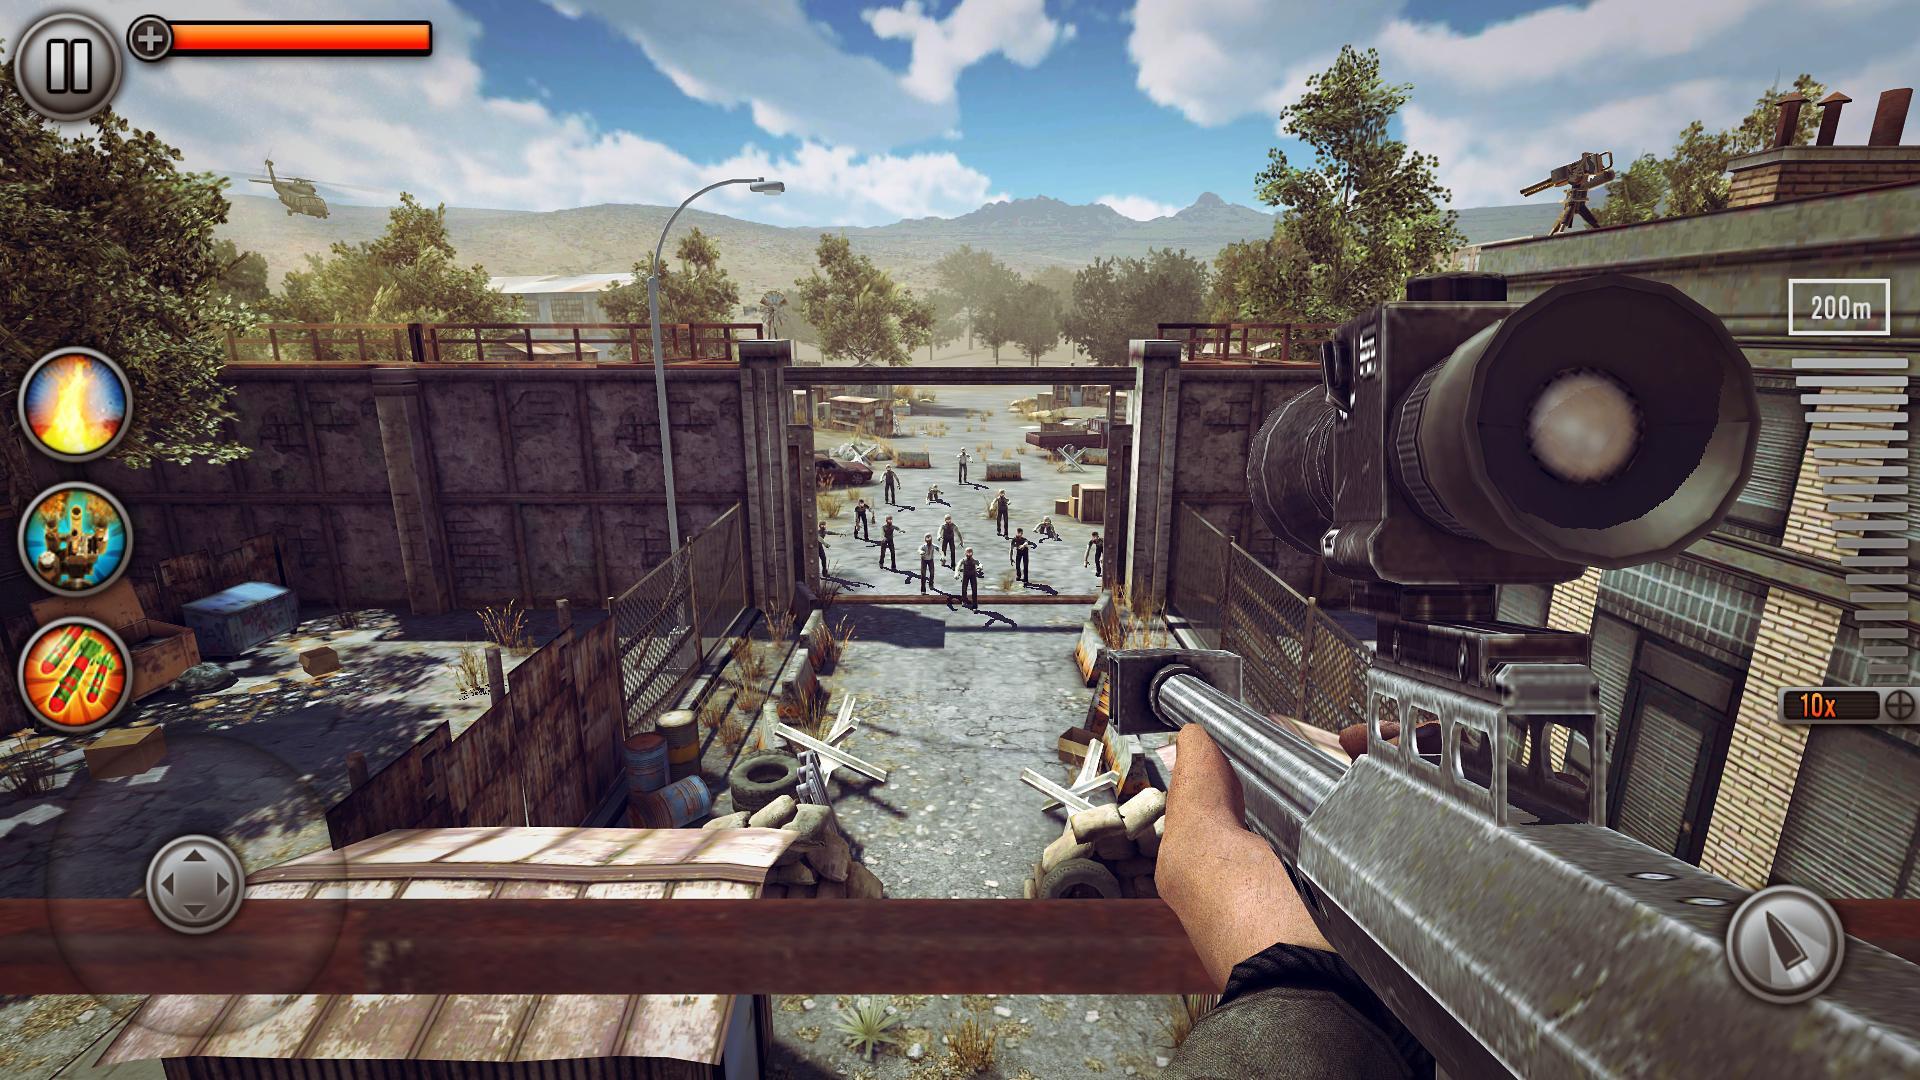 Last Hope Sniper Zombie War: Shooting Games FPS 2.12 Screenshot 9